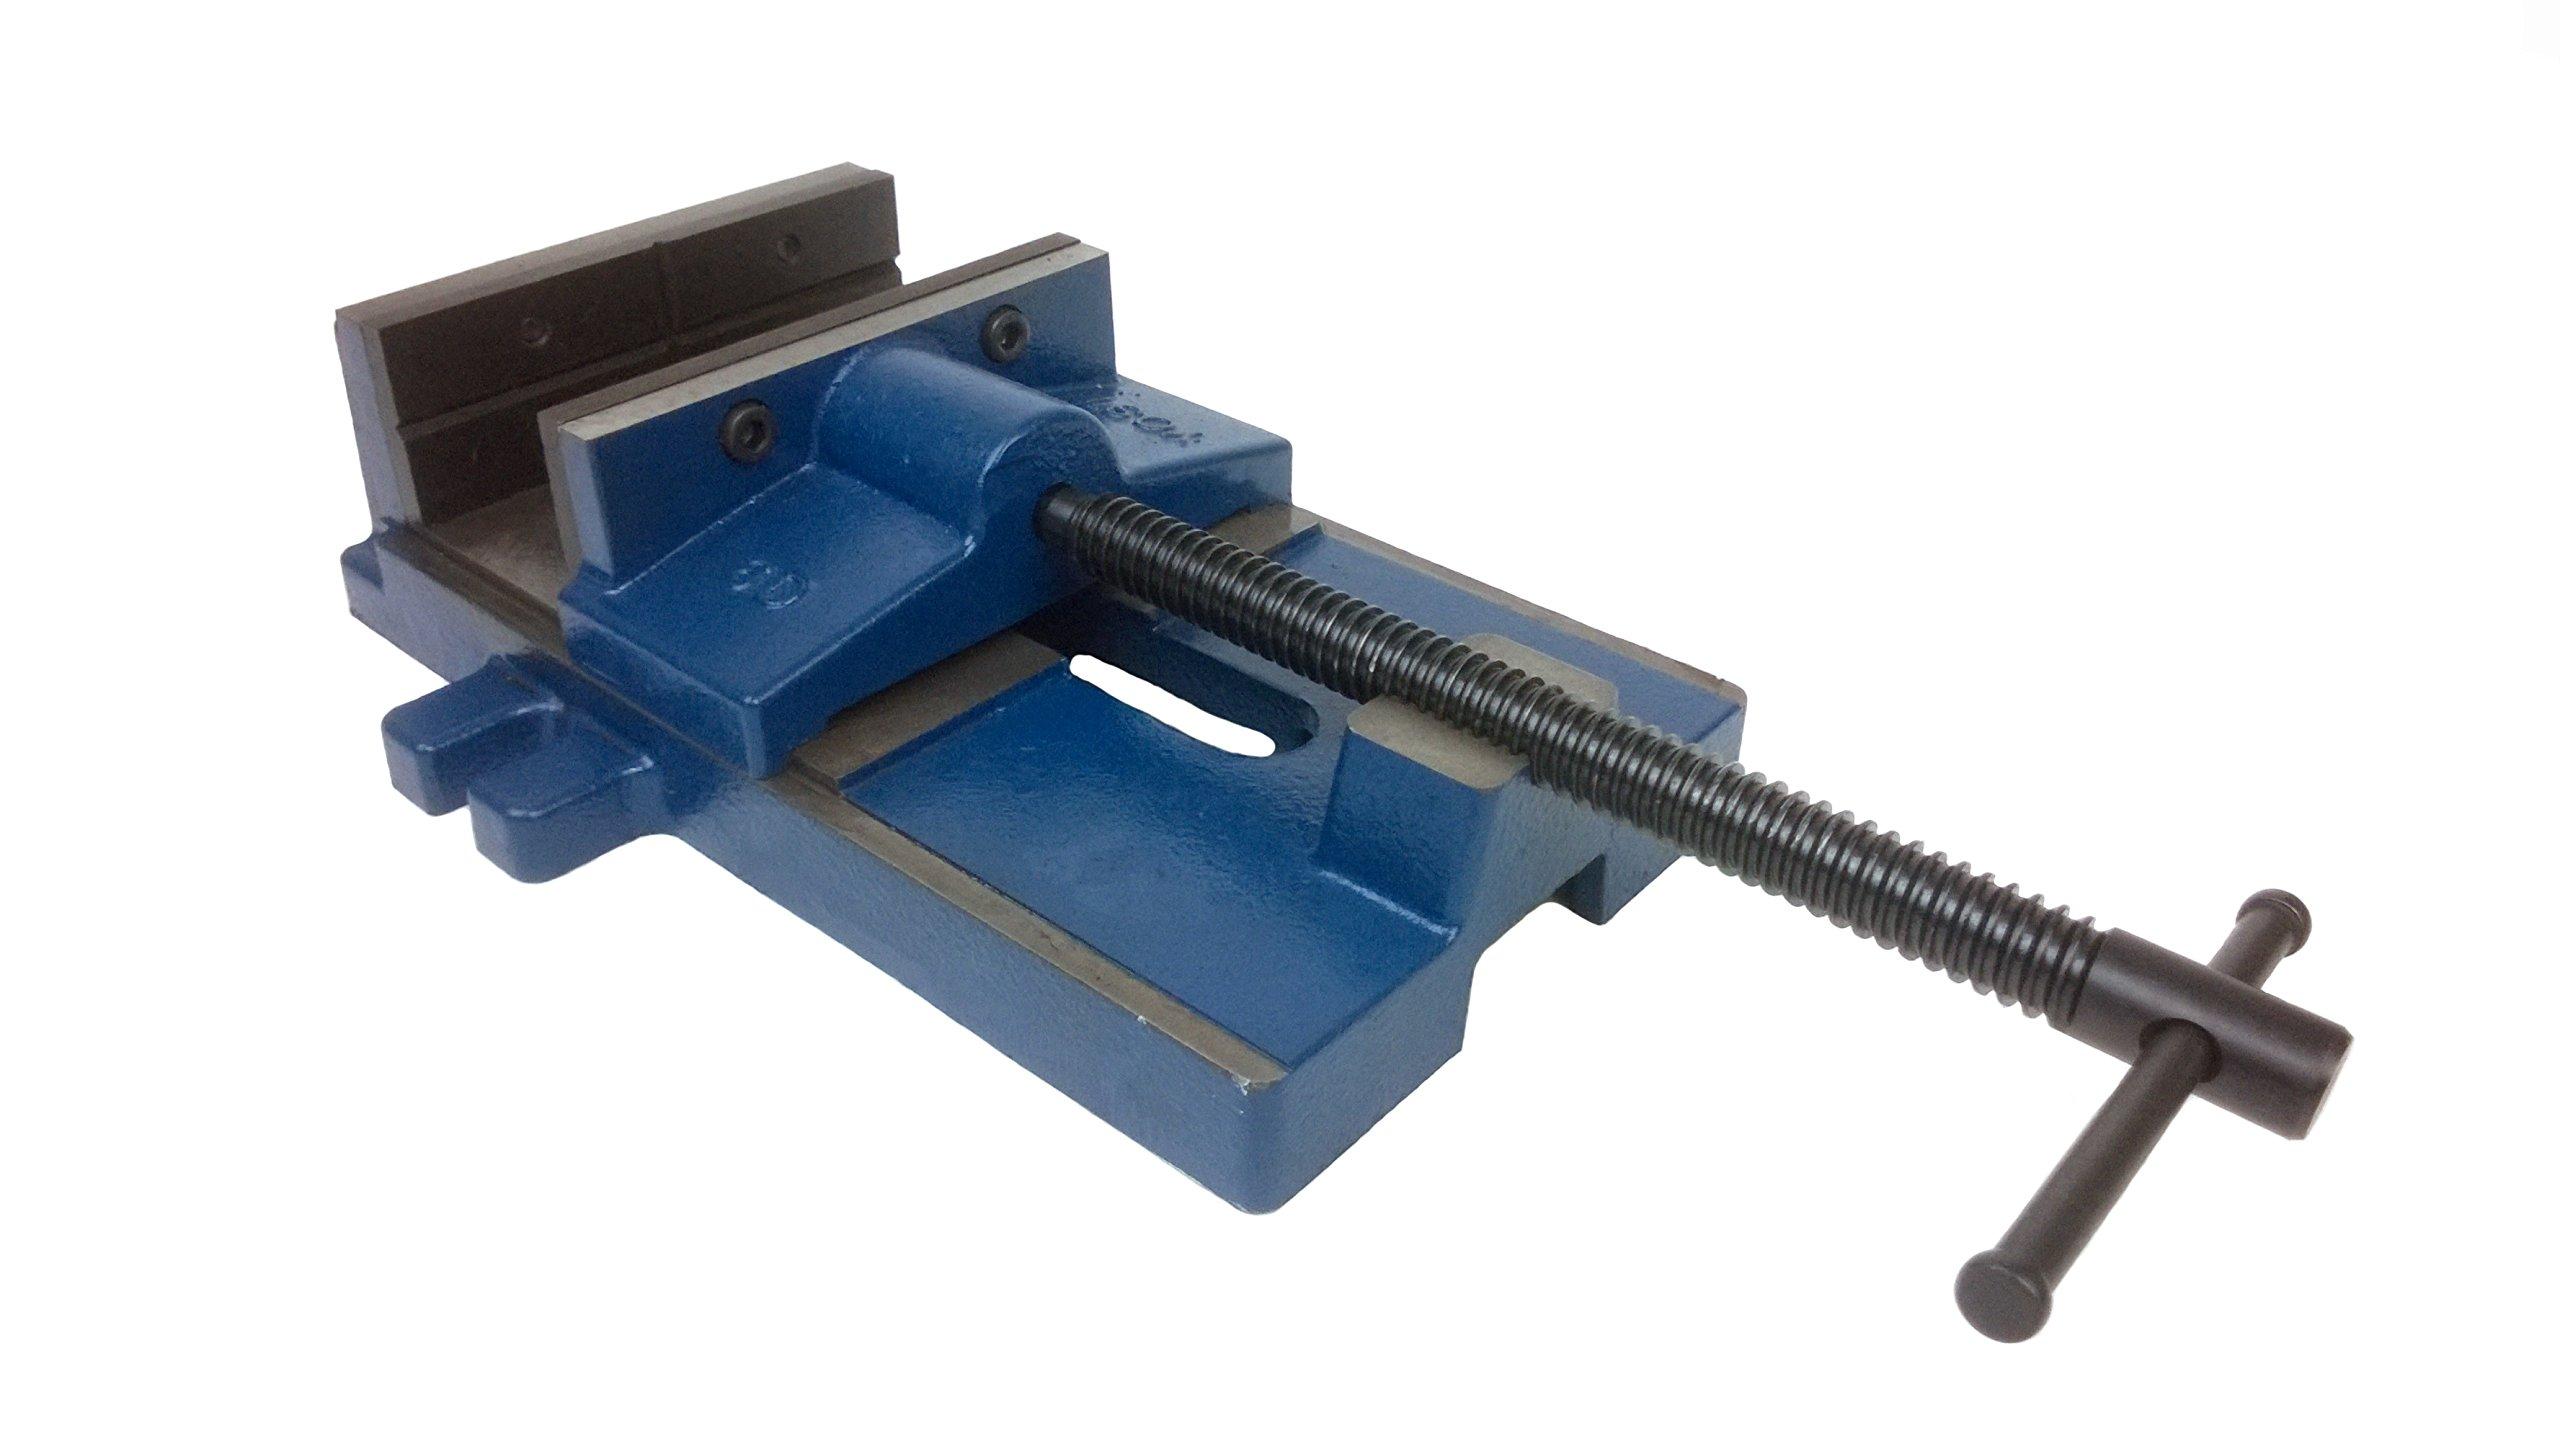 Yost 6D-QR Quick Release Drill Press Vise, 6''